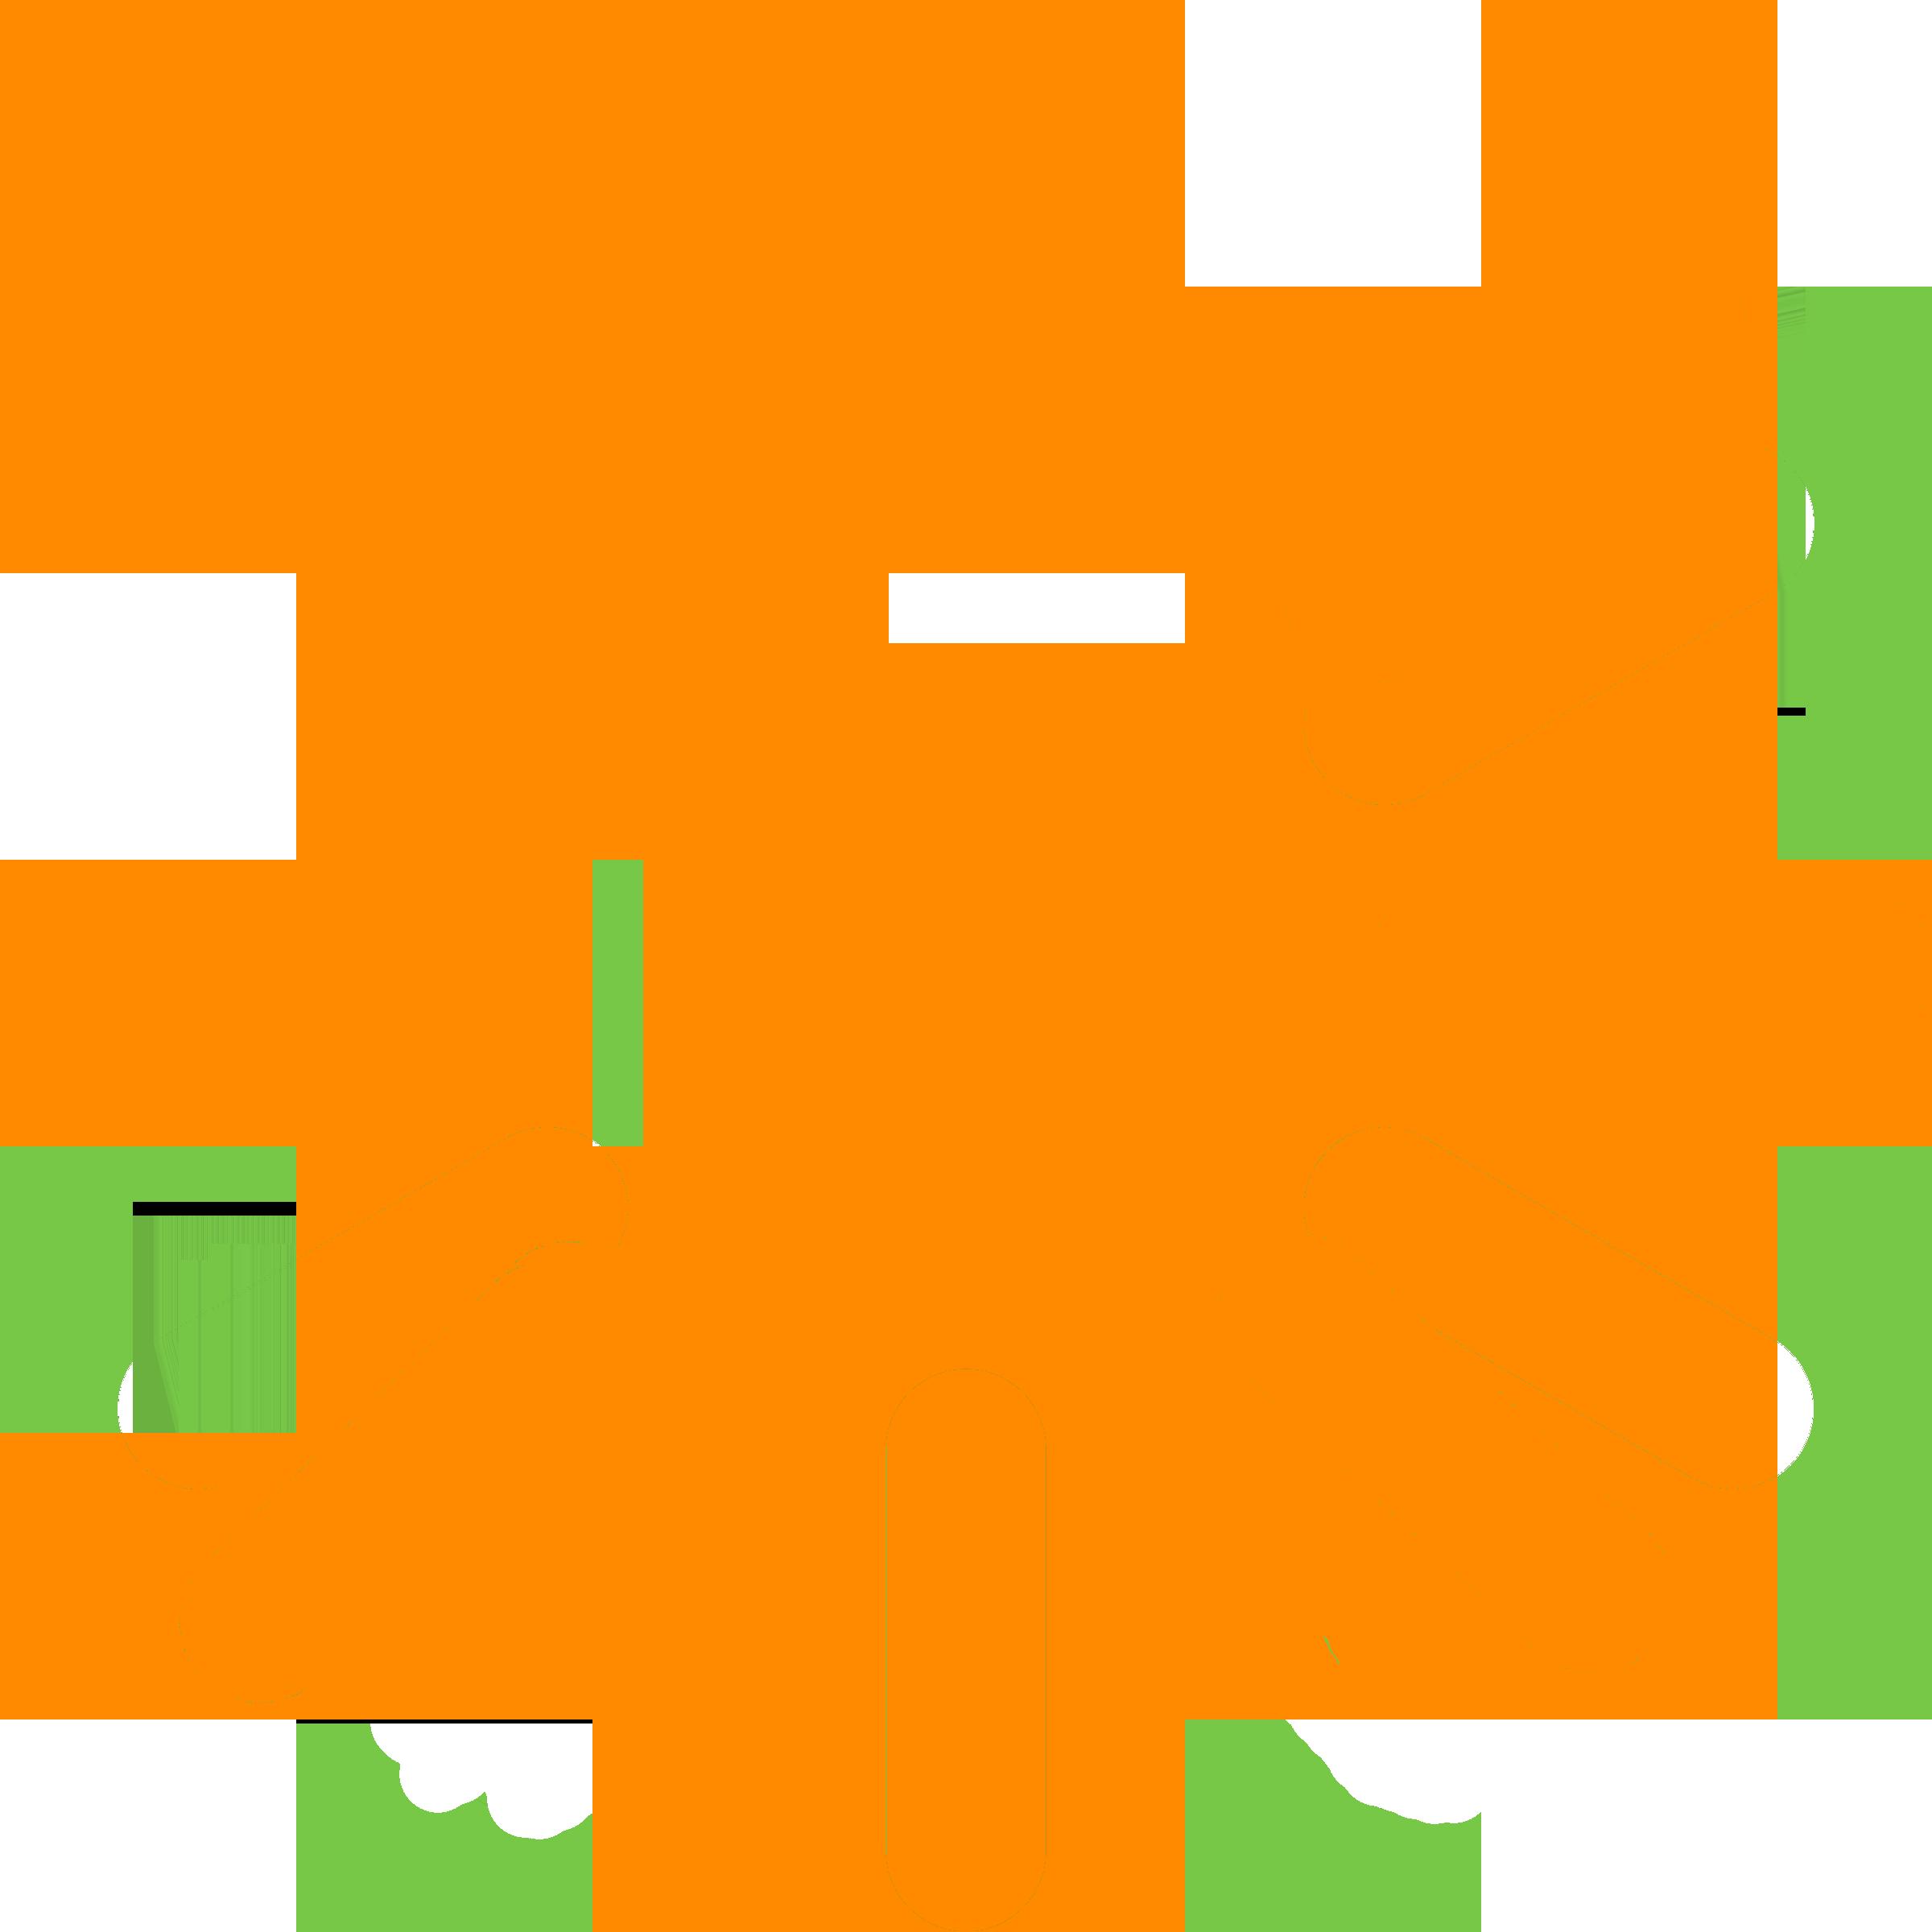 نشانگر نارنجی چشمکزن